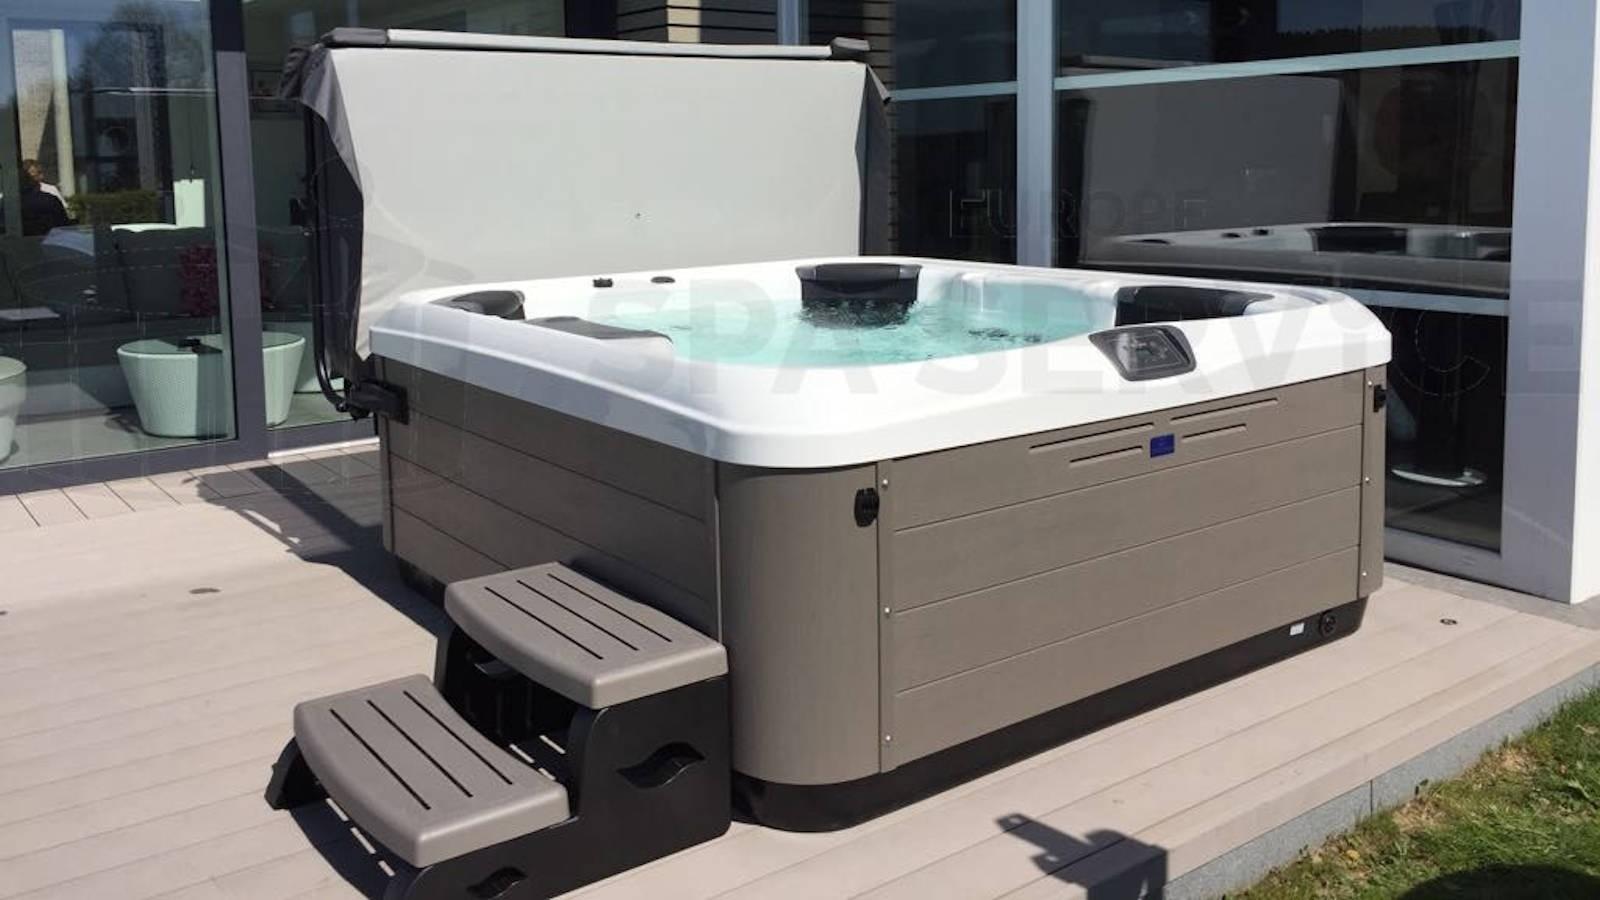 Plaatsing Villeroy & Boch R6LE spa in Francorchamps België